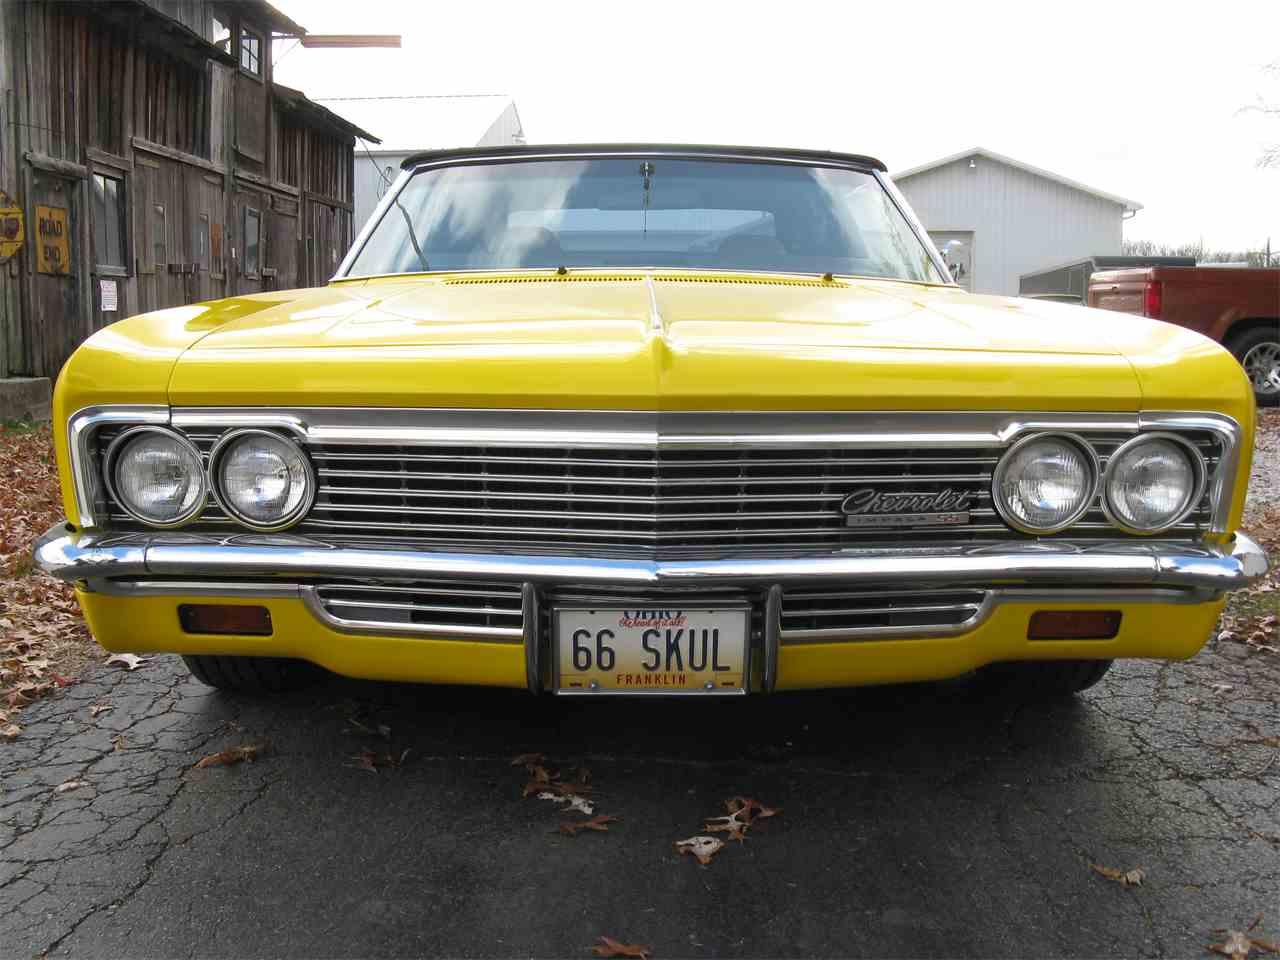 Chevrolet Dealers Columbus Ohio >> 1966 Chevrolet Impala for Sale | ClassicCars.com | CC-931671